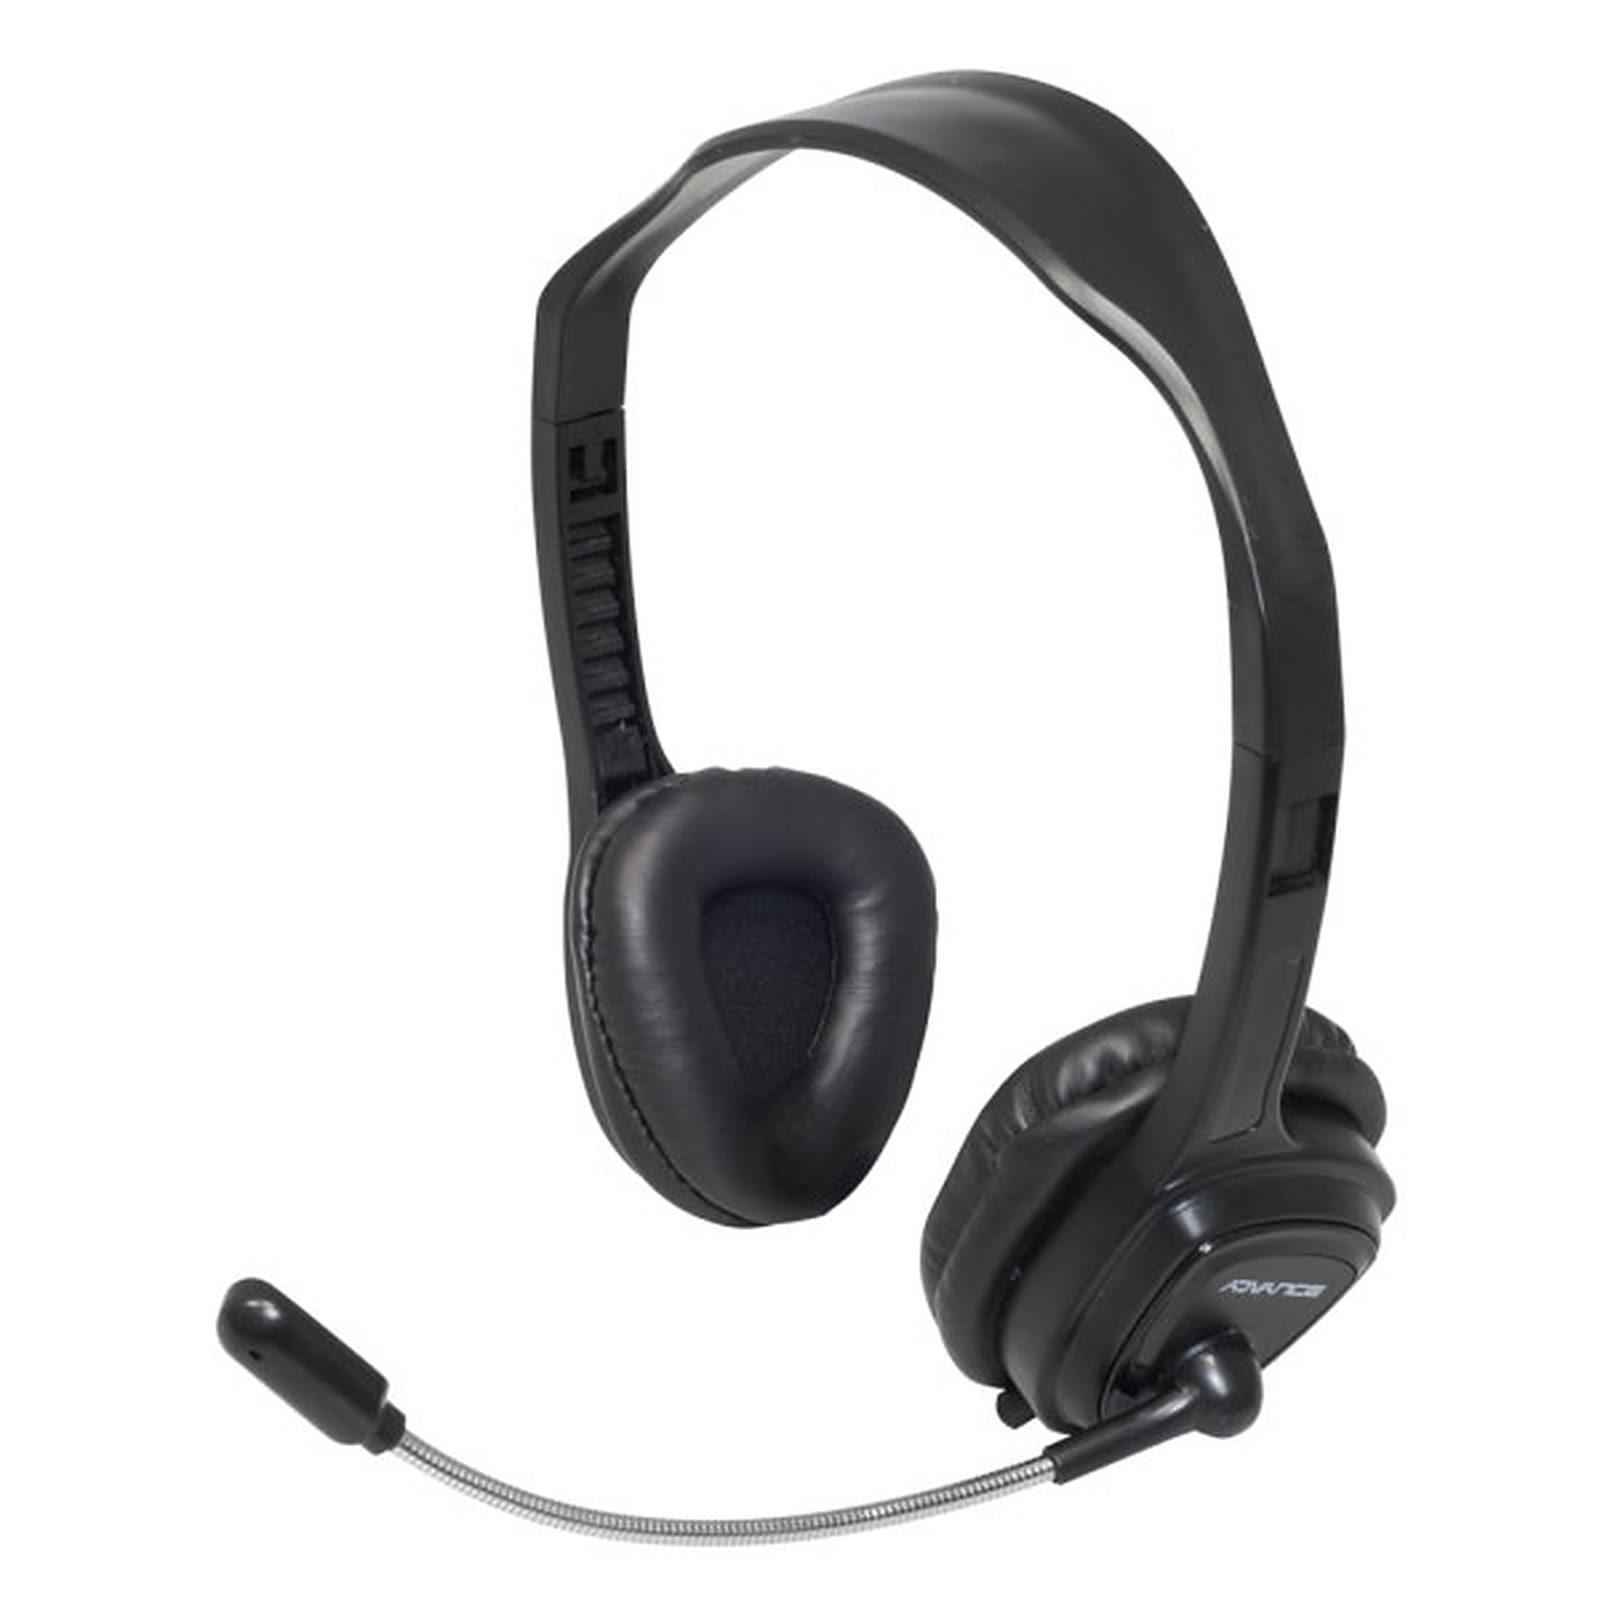 Advance Casque Multimédia Headphonics Smart Stereo - Micro-casque - 2